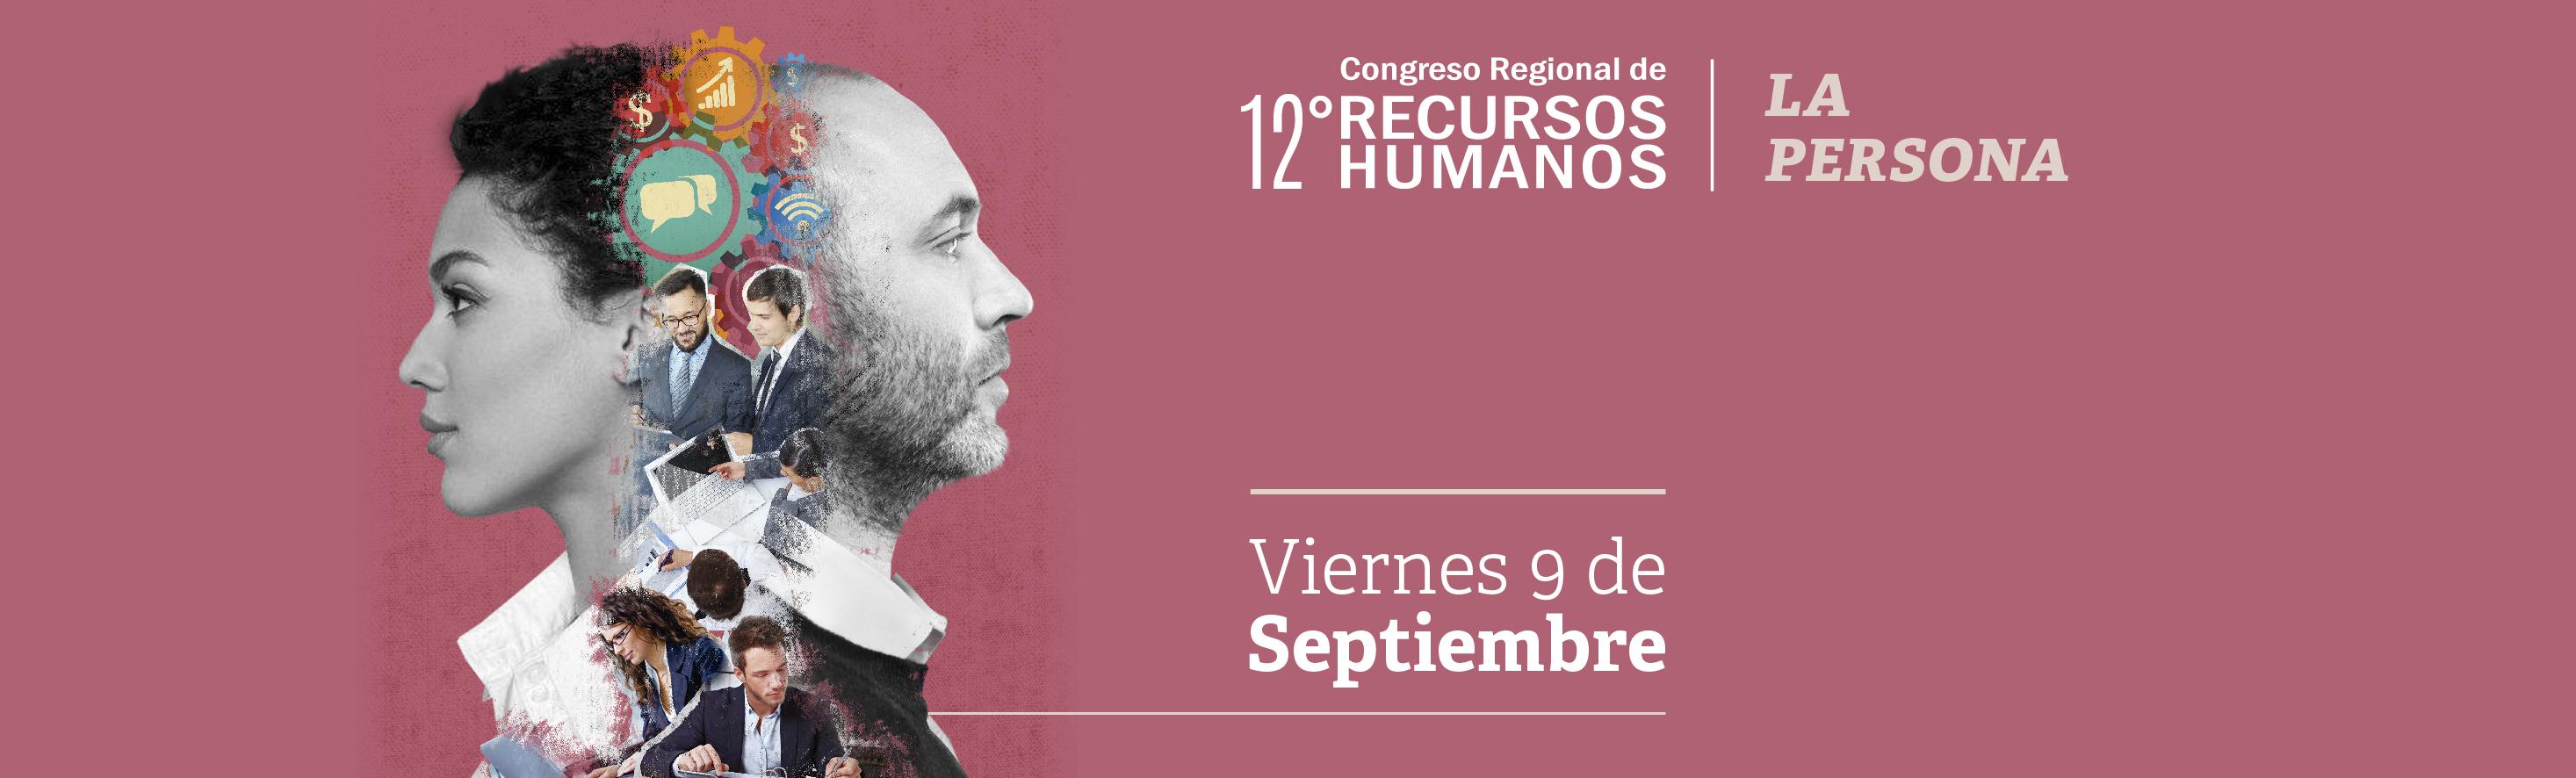 Congreso de Recursos Humanos 2016